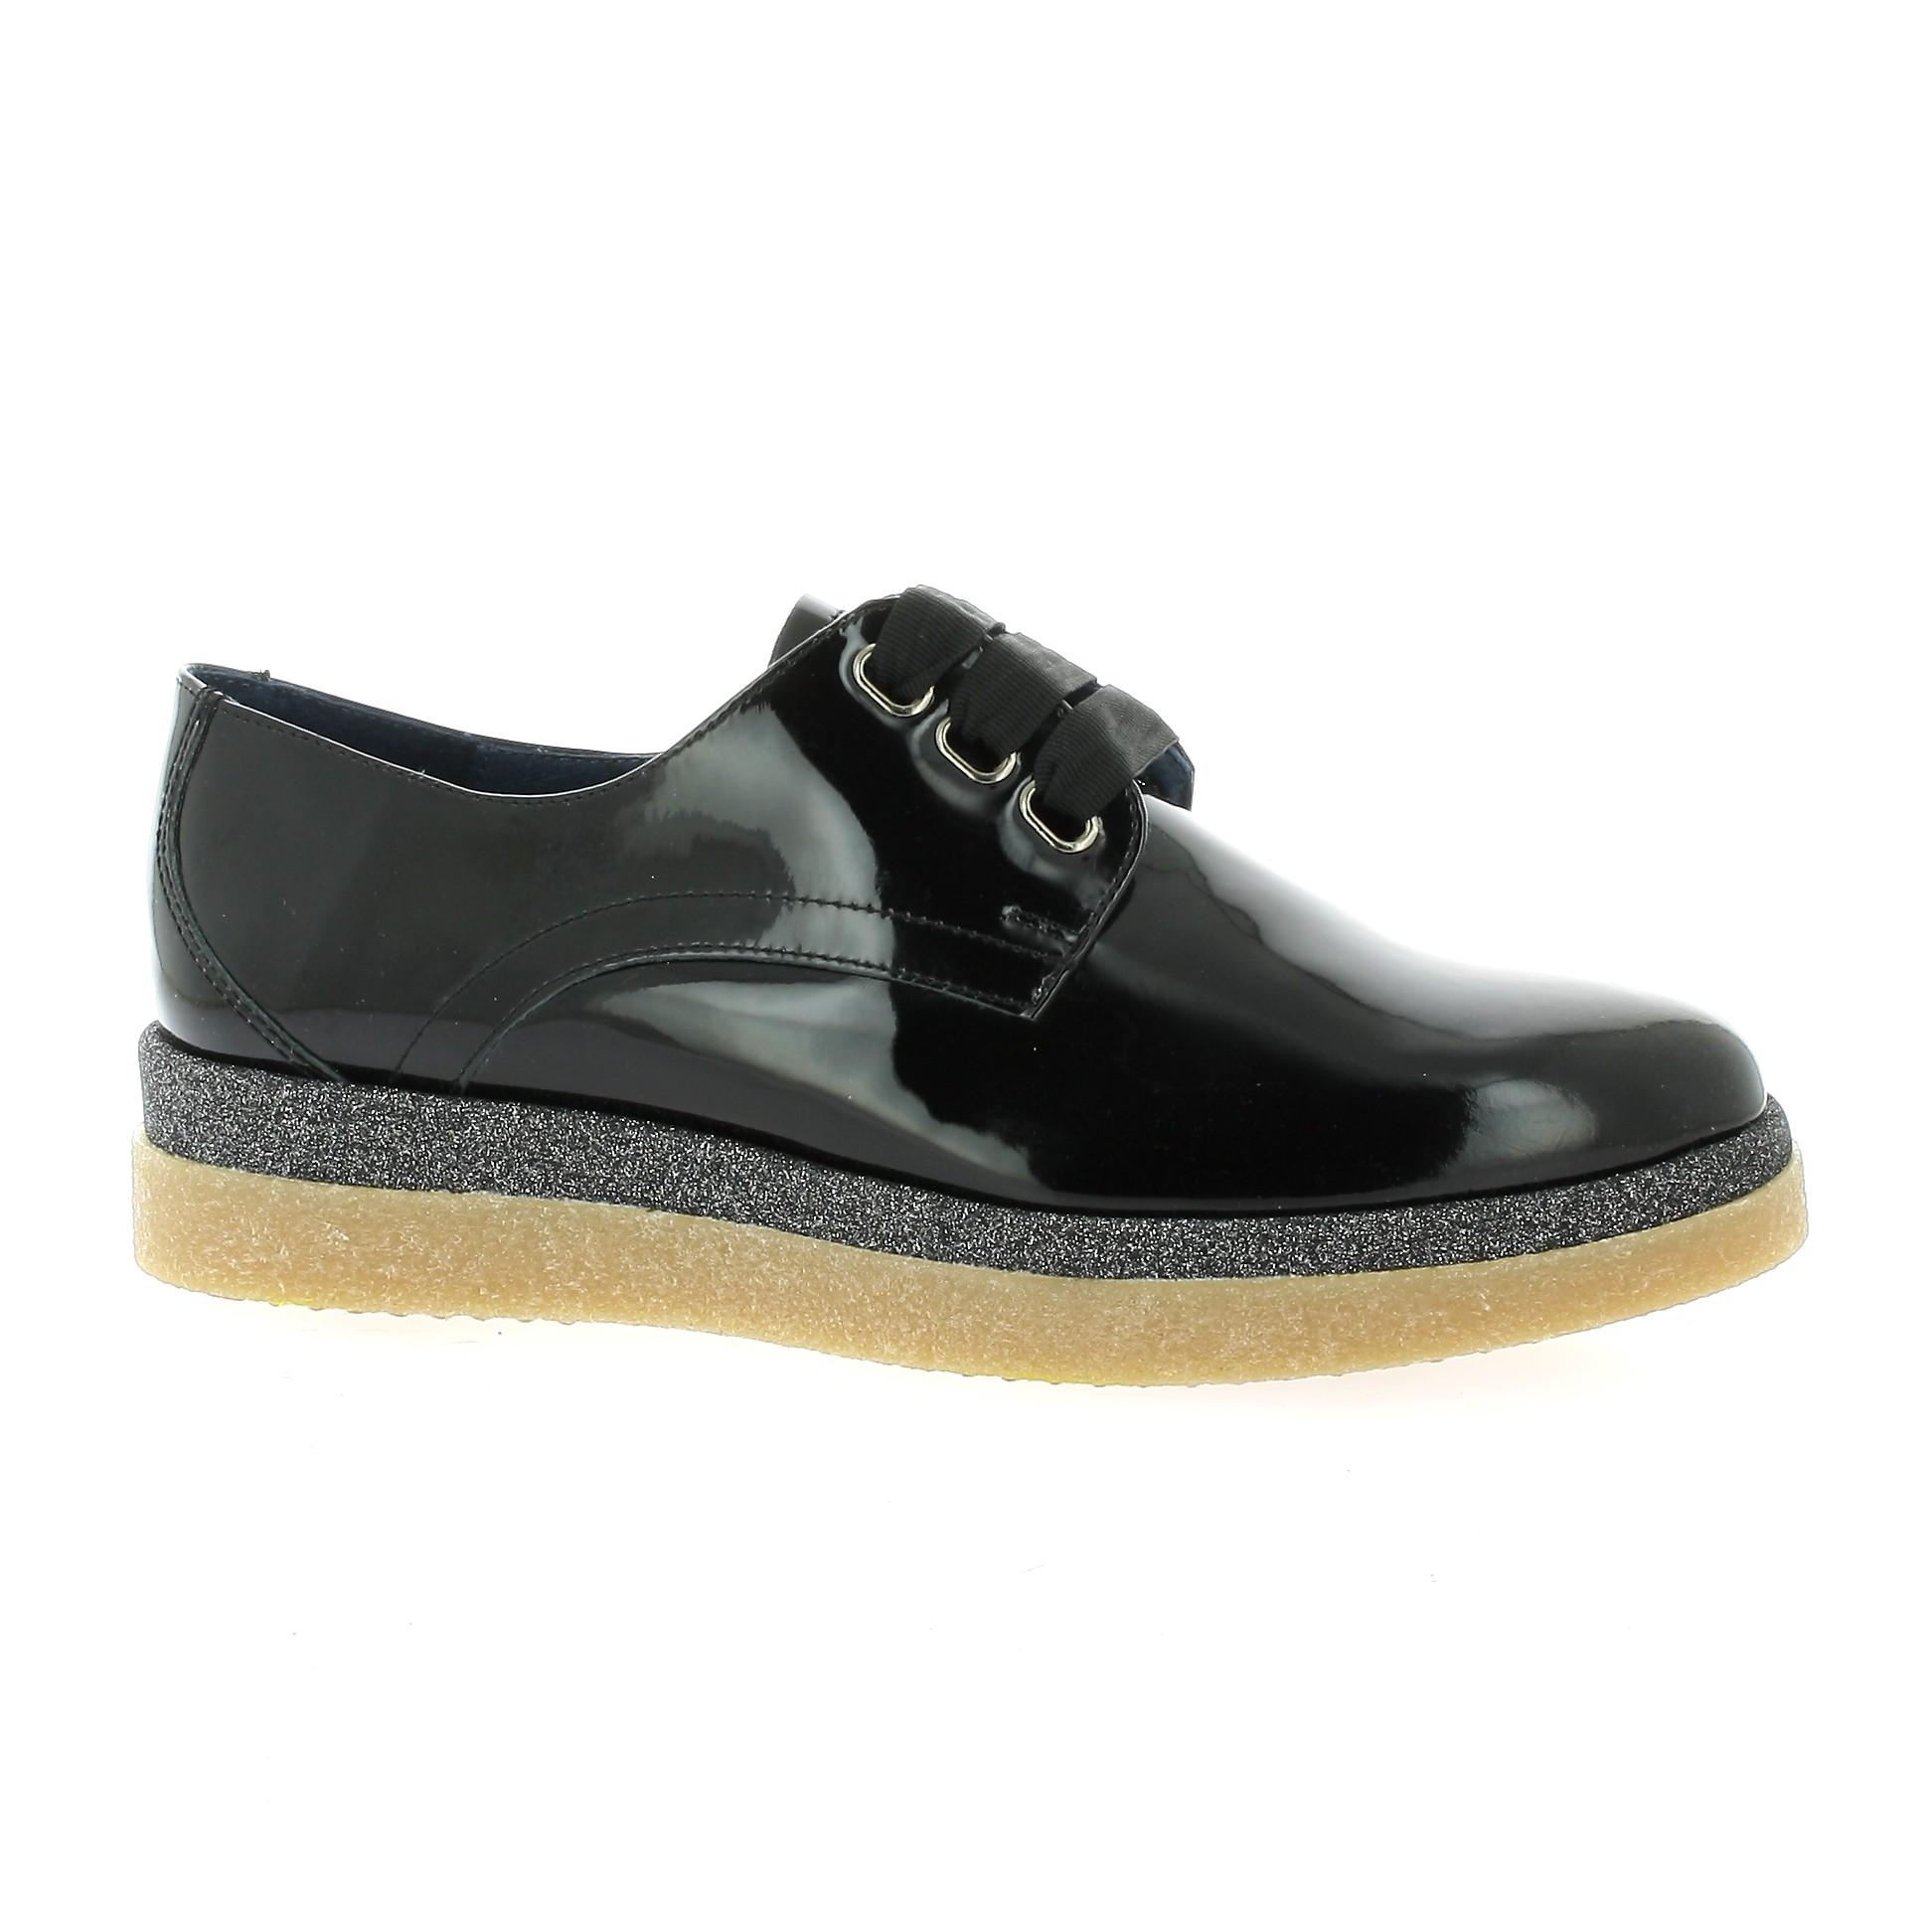 Sanita Fenja Open Chaussures Tosca Blu jaunes femme Pao Chaussures Derby cuir vernis Pao soldes Chaussures Rêve d'un jour marron femme PKpqxXMBe